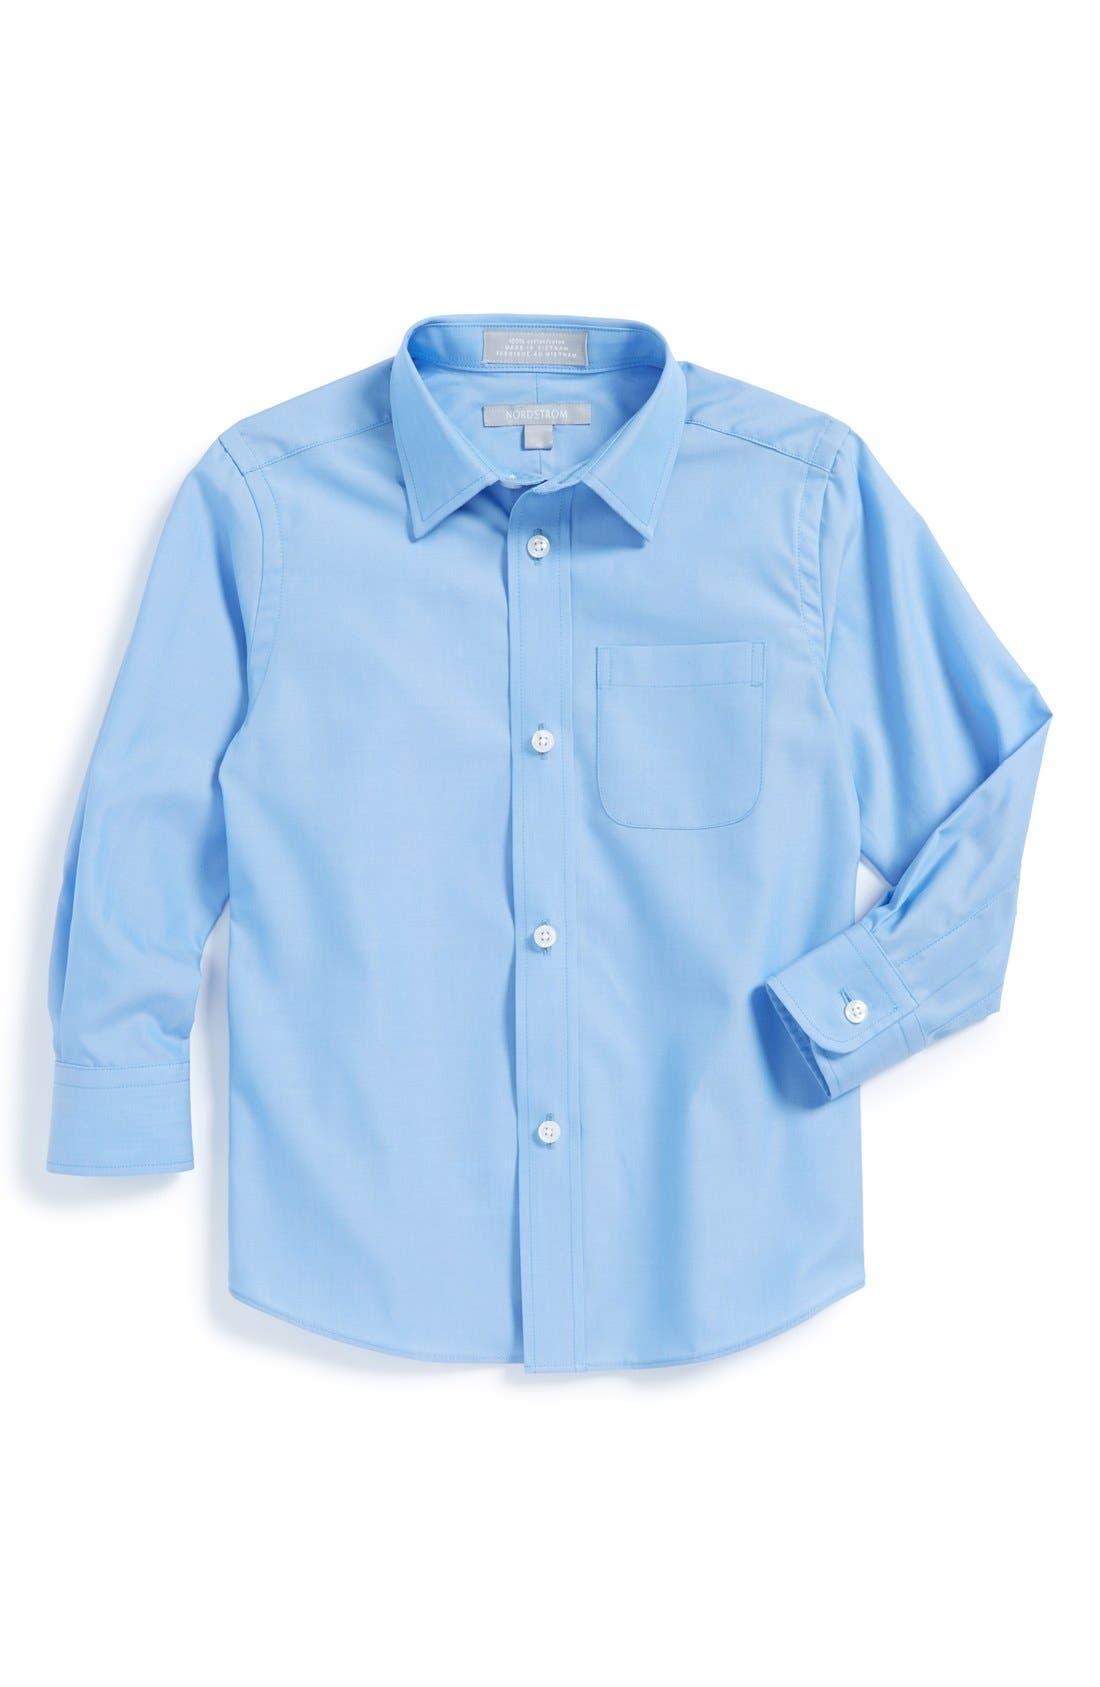 NORDSTROM, Cotton Poplin Dress Shirt, Main thumbnail 1, color, BLUE SMART